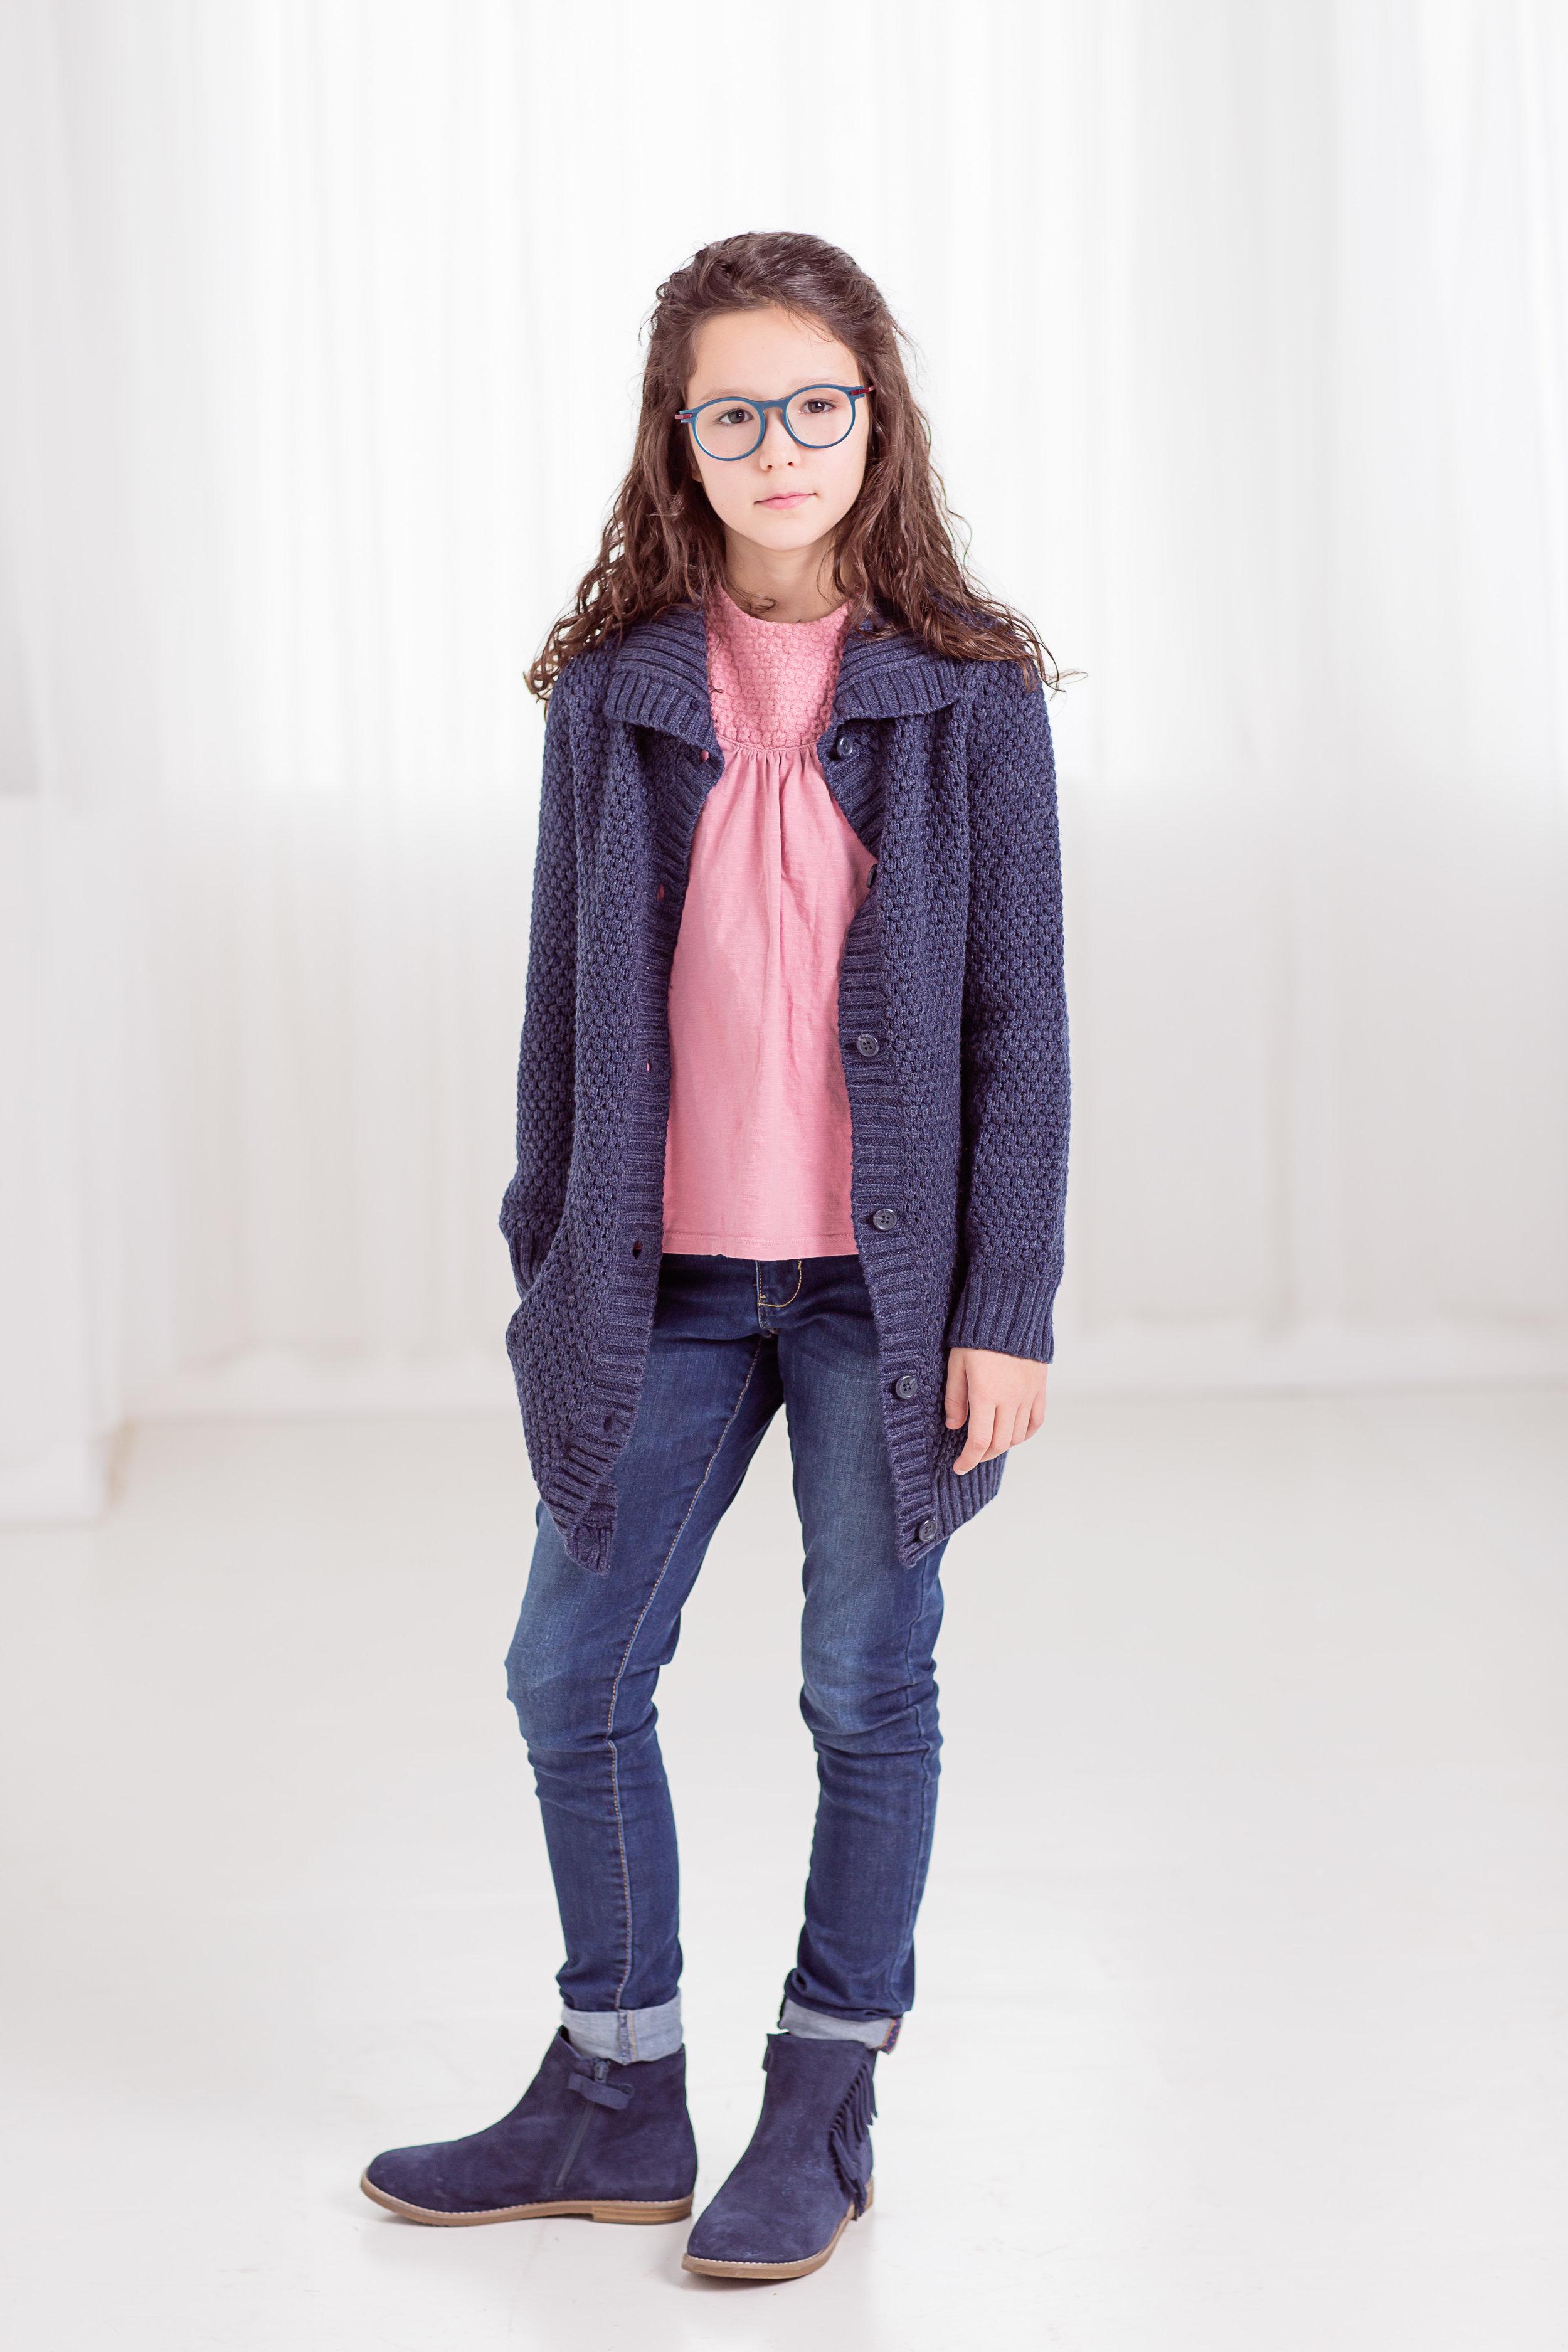 BiancaMorelloPortraits-AgencePeanut-kids-302.jpg